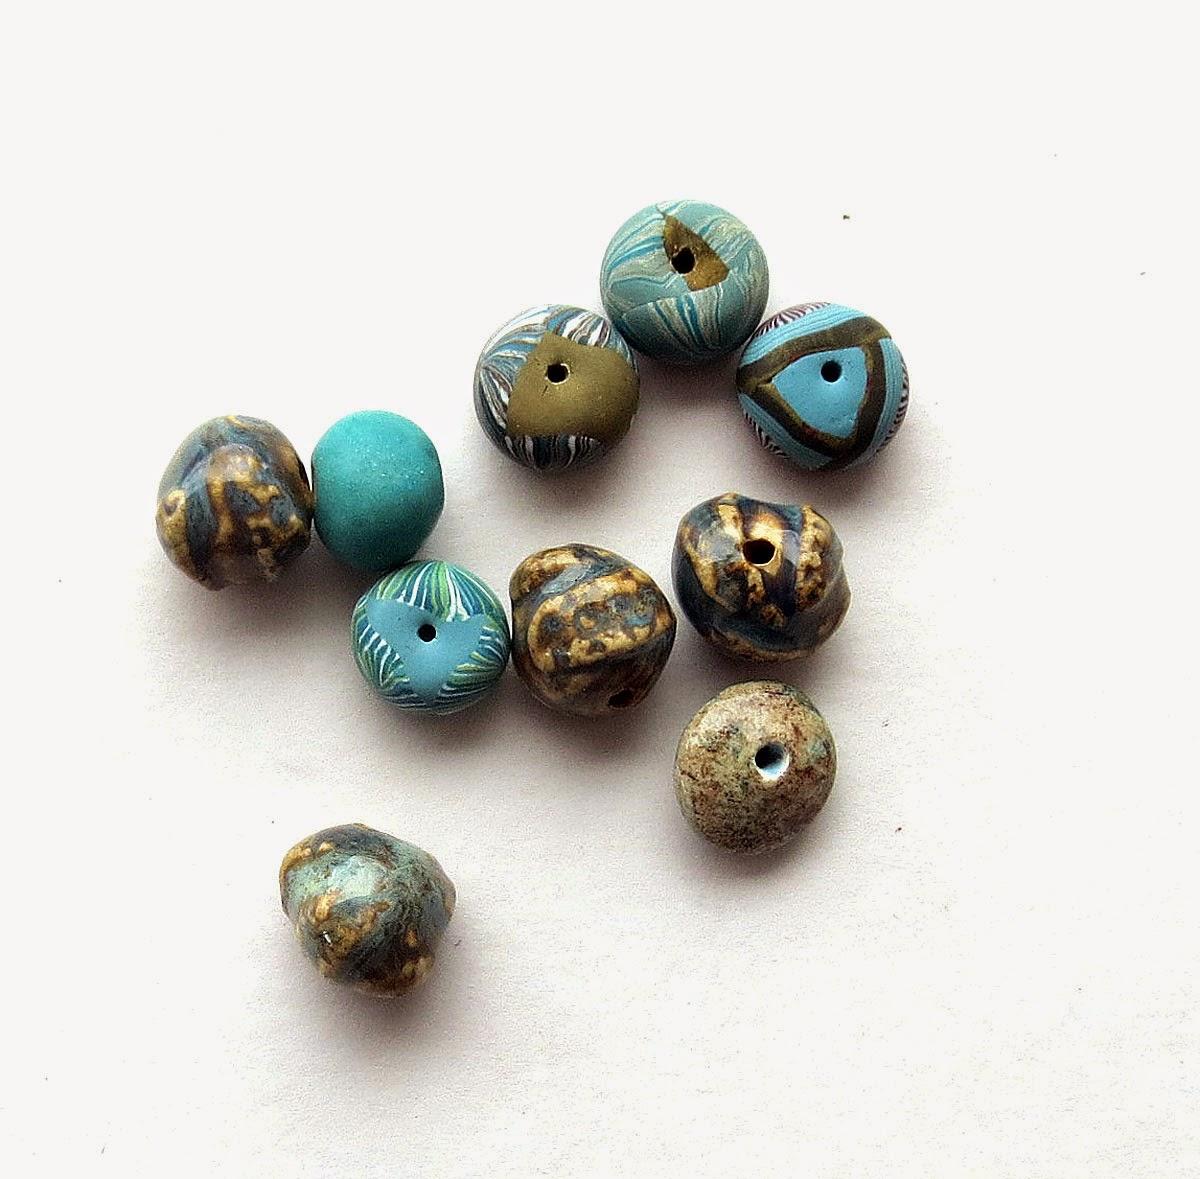 Ceramic Bead Beads: Art Bead Scene Blog: Tutorial: Art Beads. Macrame And Leather